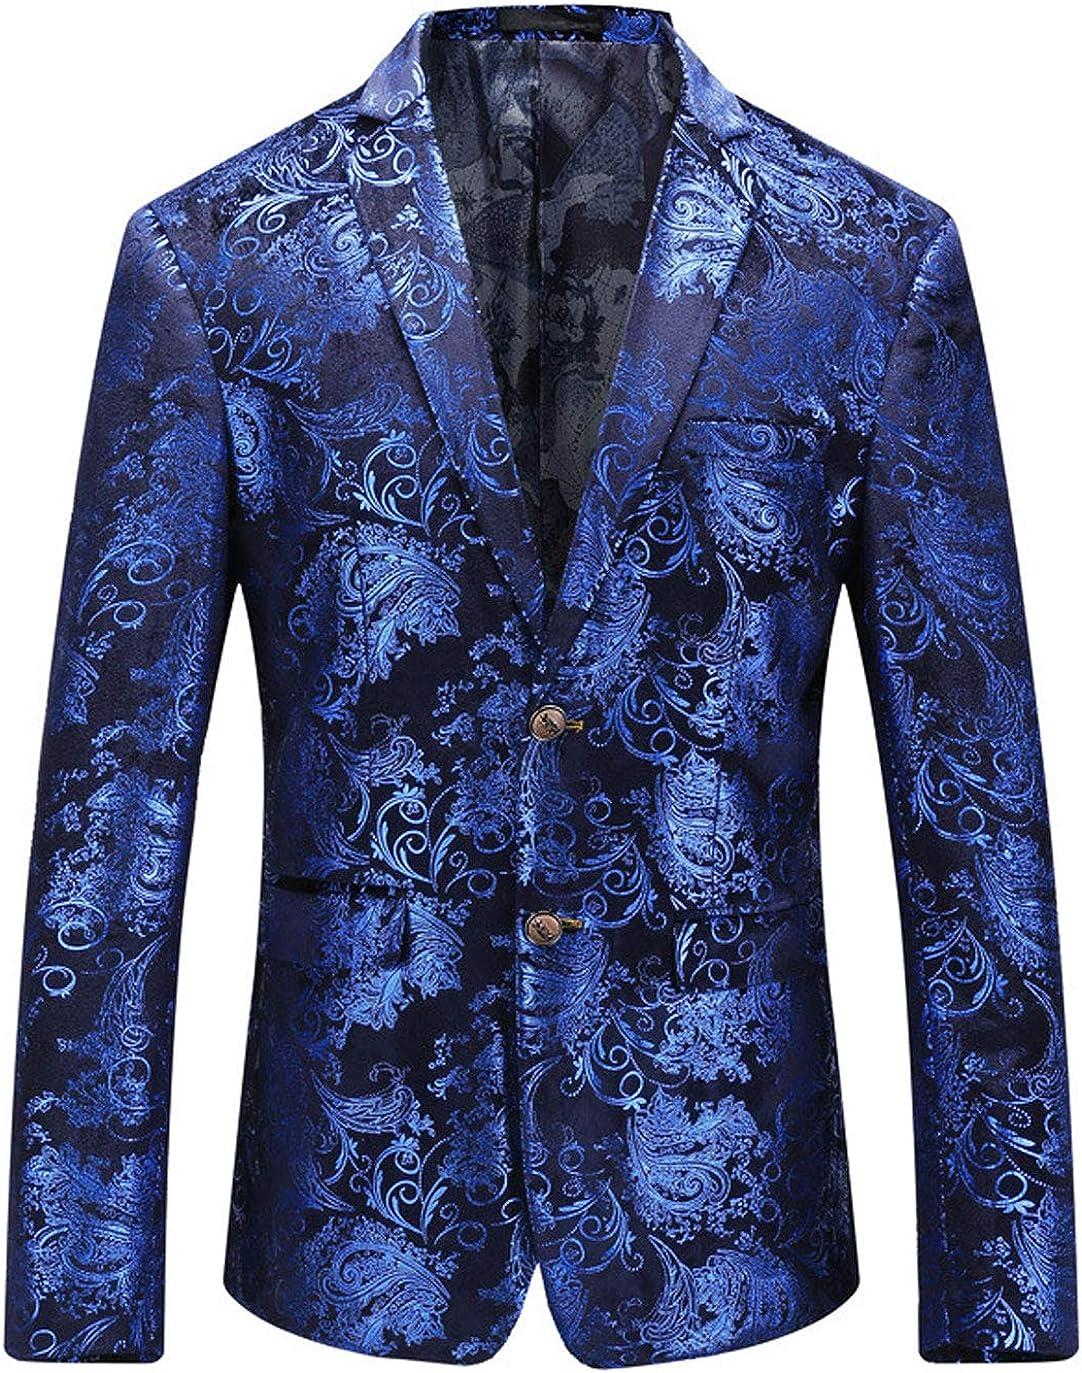 ebossy Men's Paisley Floral Suit Jacket Luxury 2 Button Slim Blazer Sport Coat Dinner Party Wedding Prom